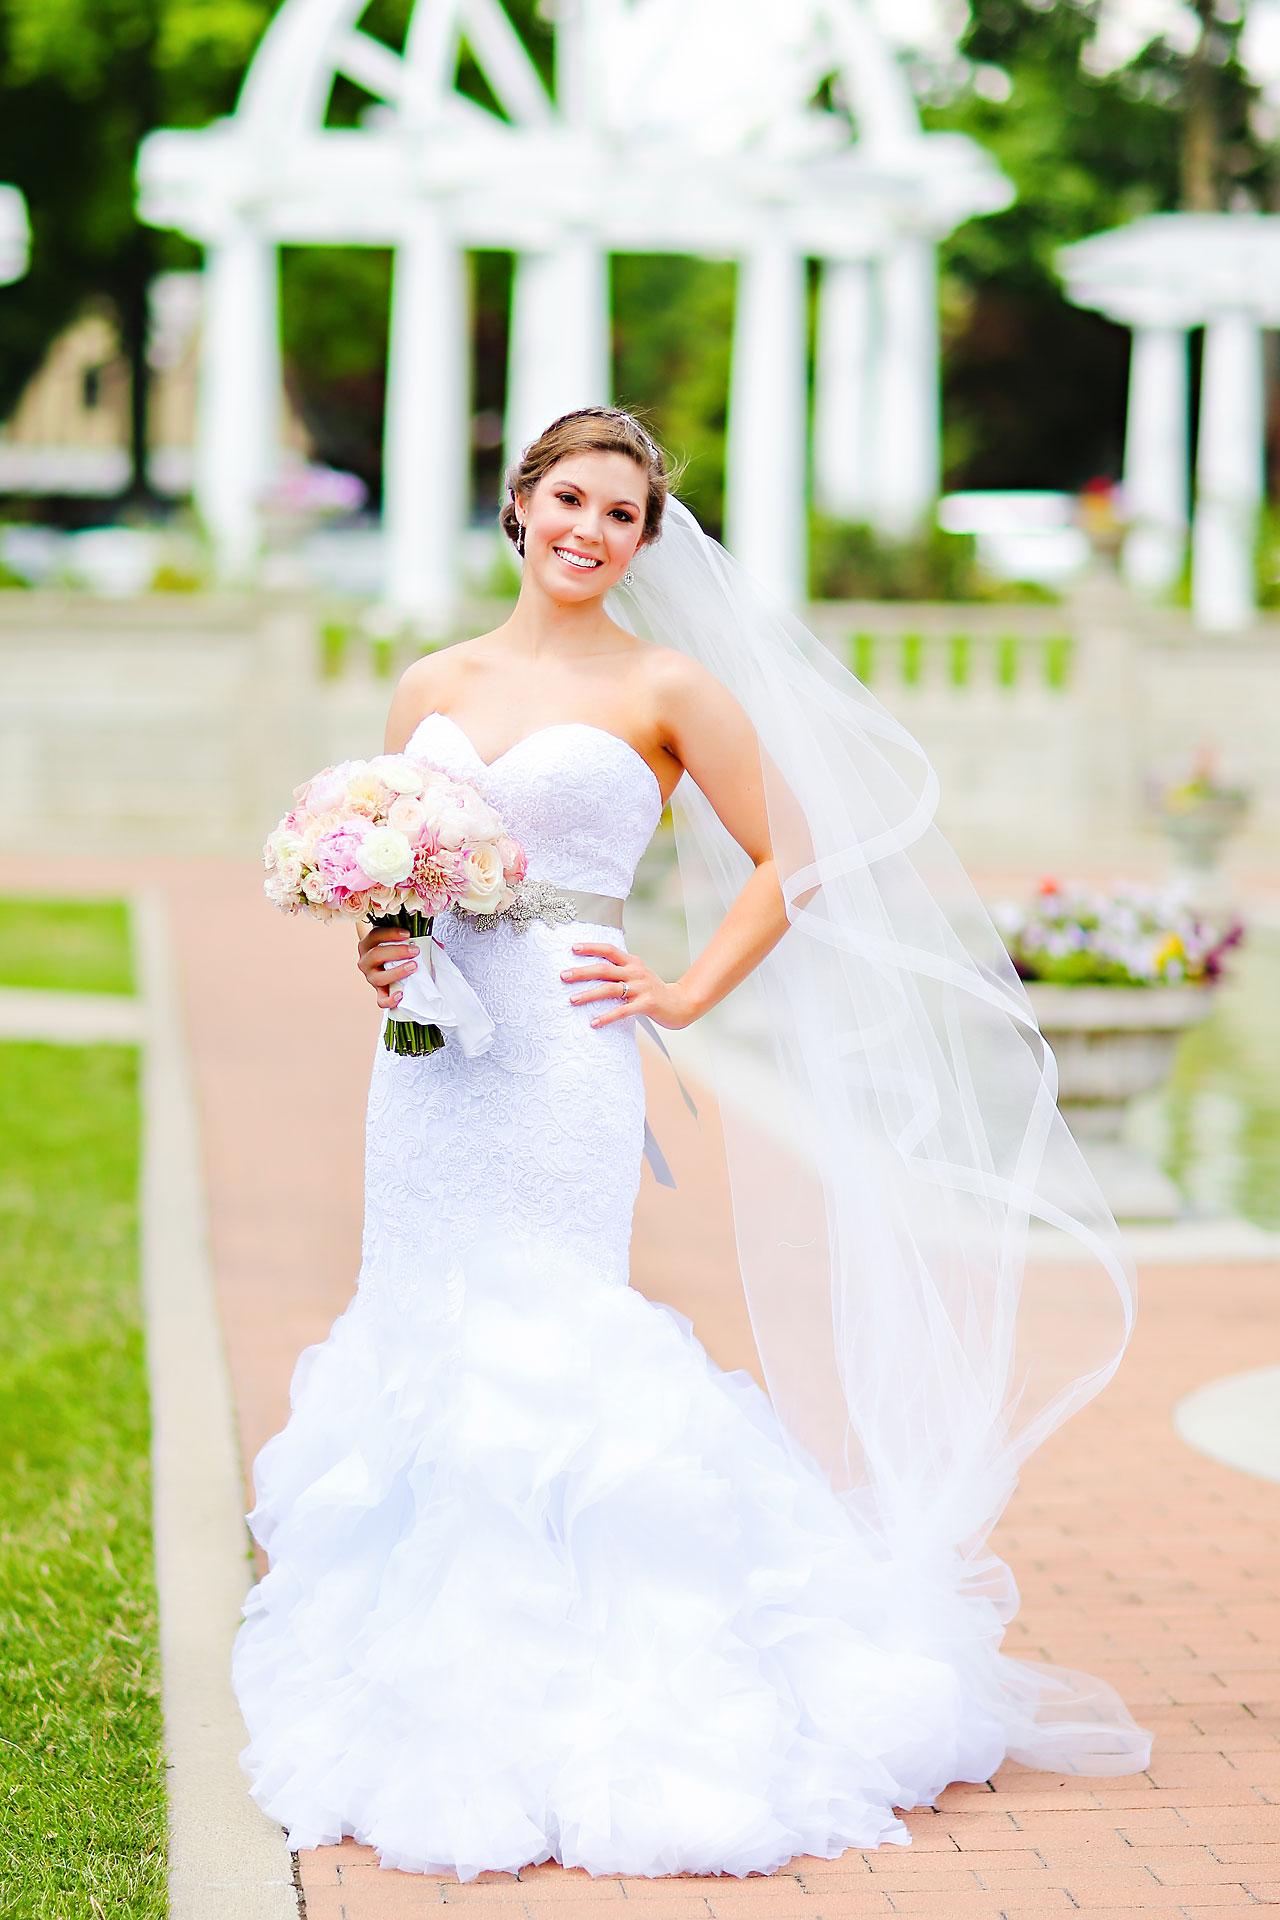 Emmy Benji Emyprean Fort Wayne Wedding 063